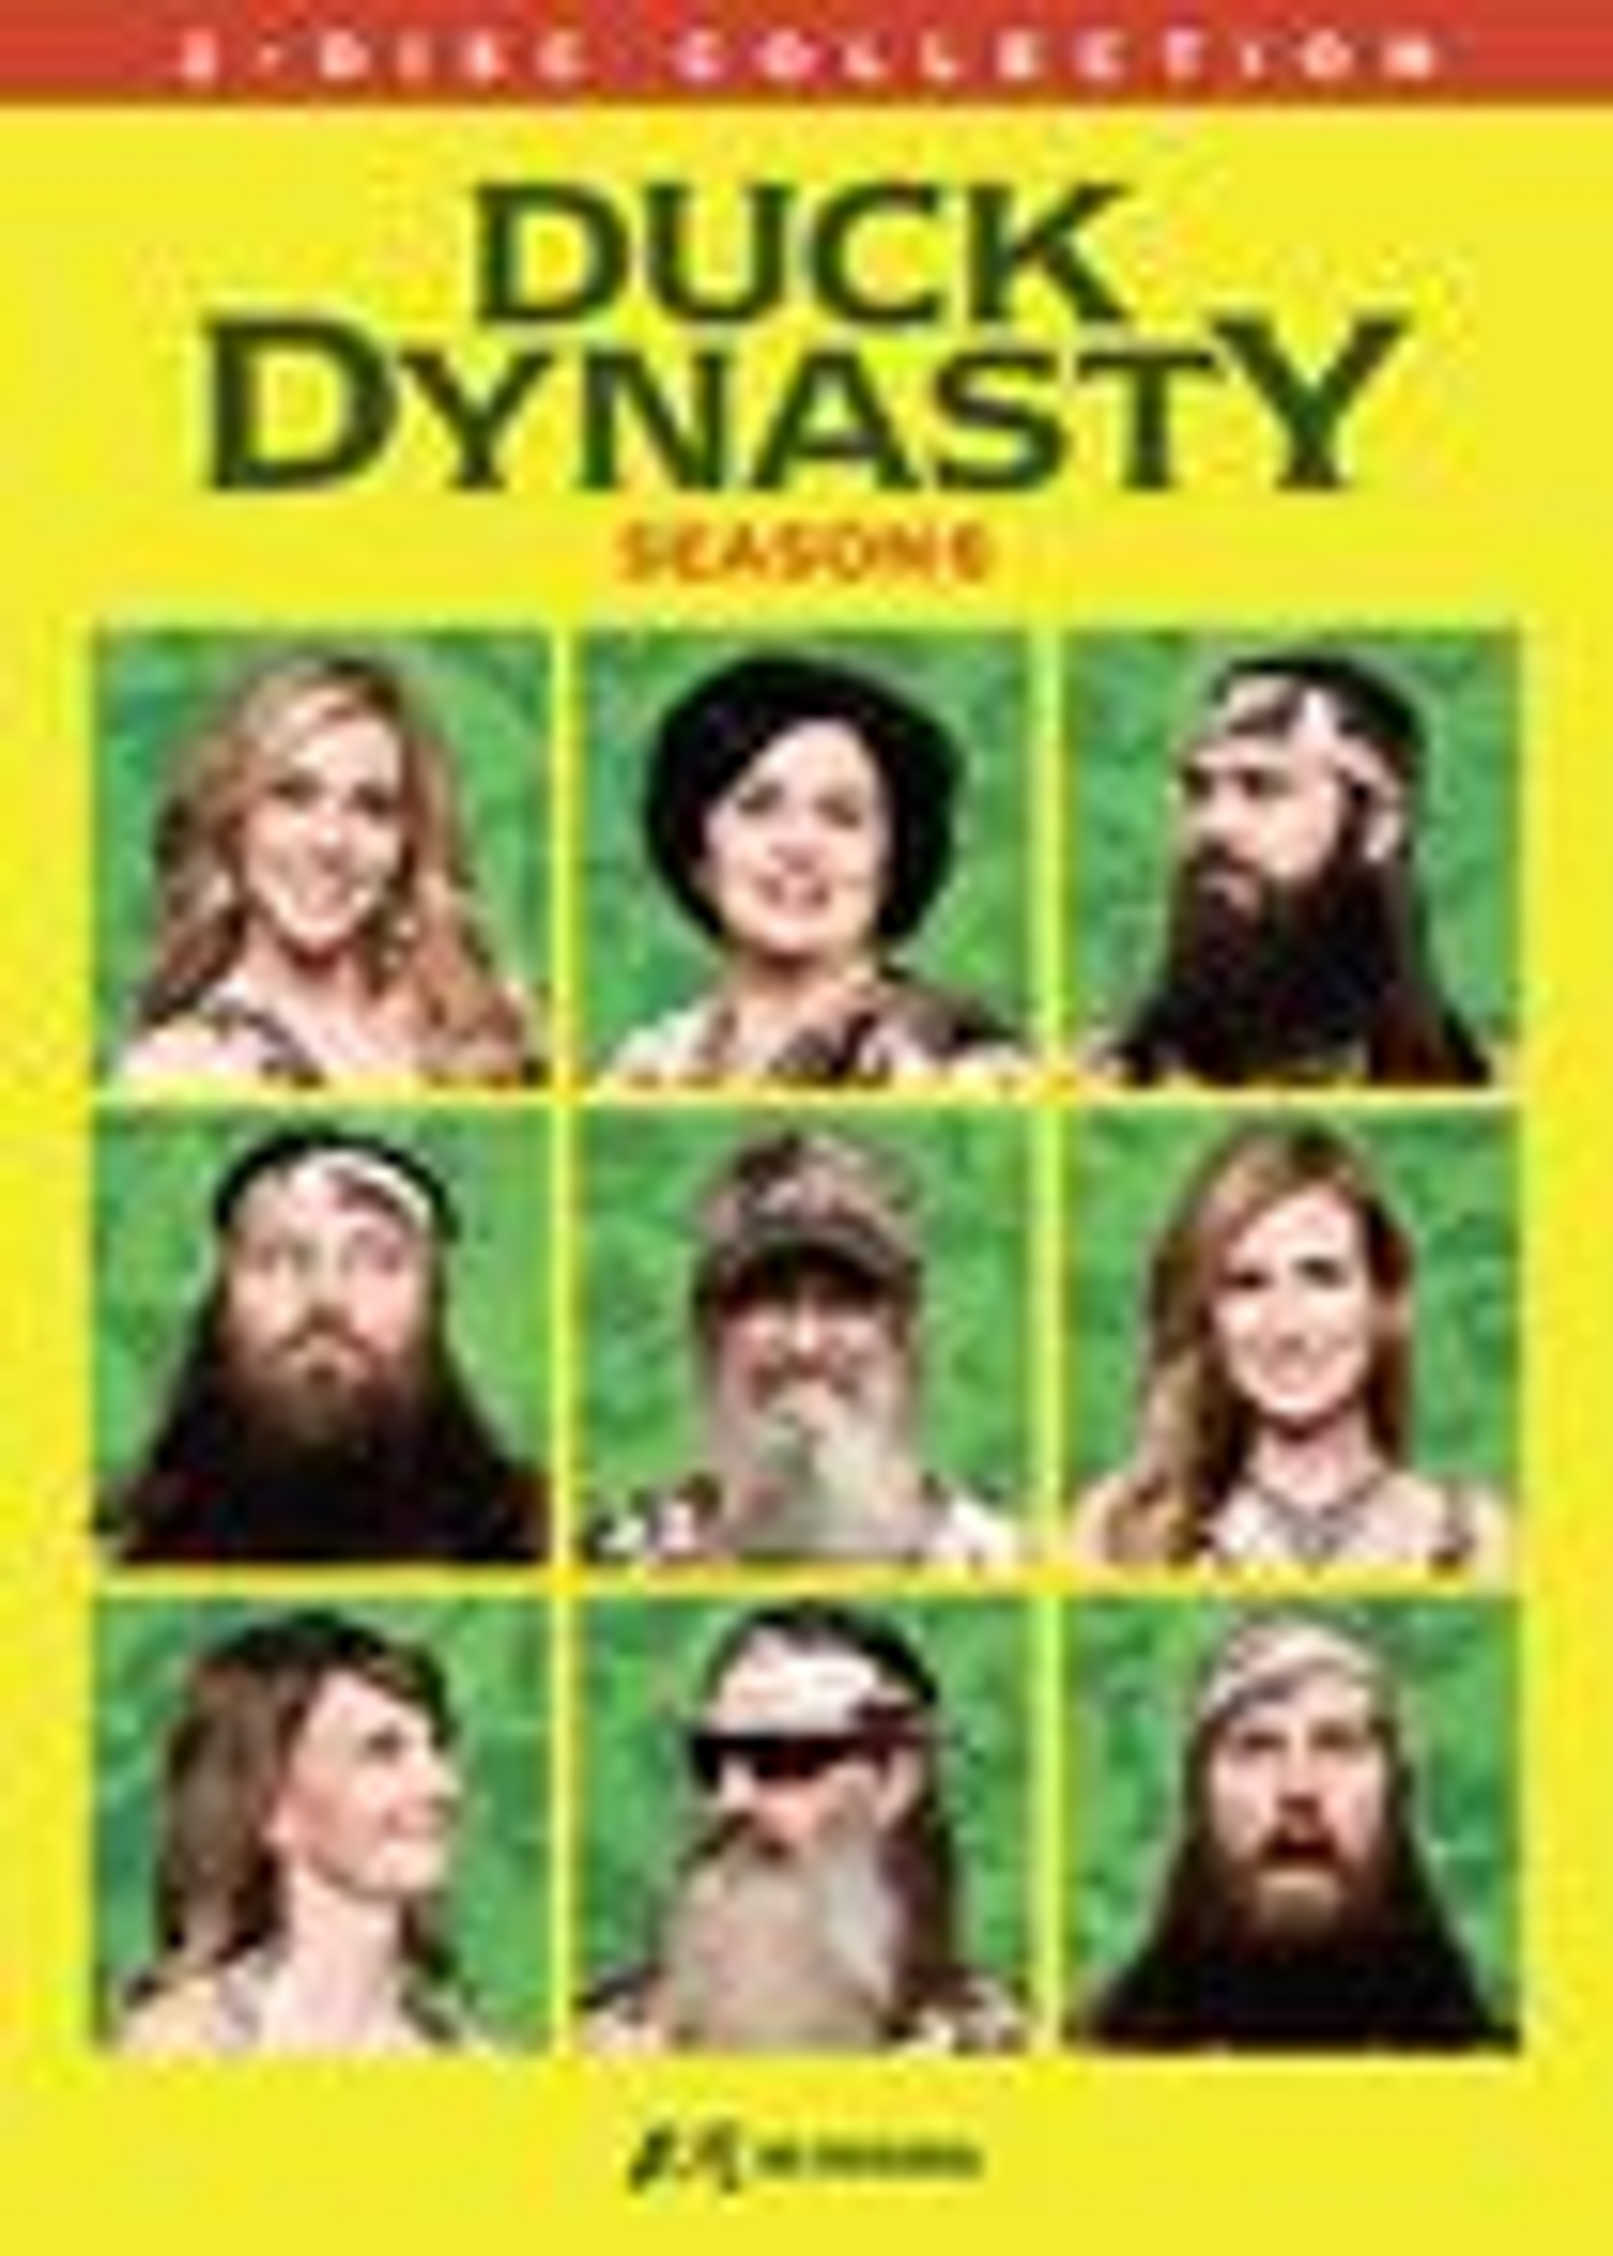 Duck Dynasty: Season 6 [2 Discs] (dvd) 8434266